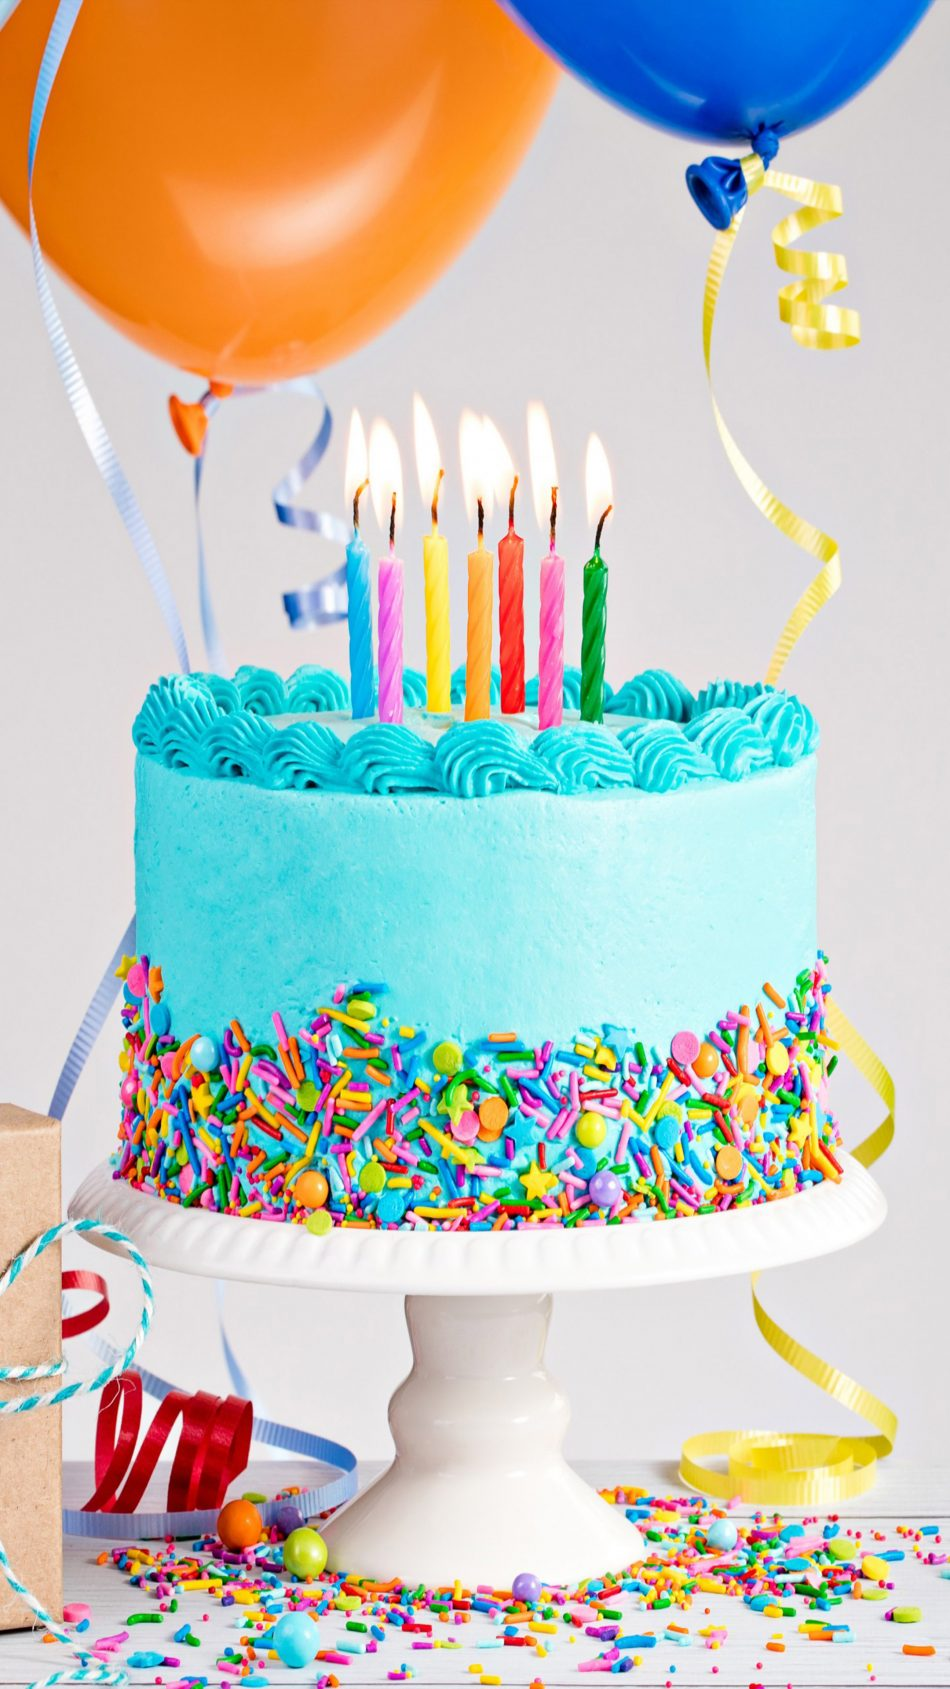 Birthday Cake Balloon Gift 4K Ultra HD Mobile Wallpaper